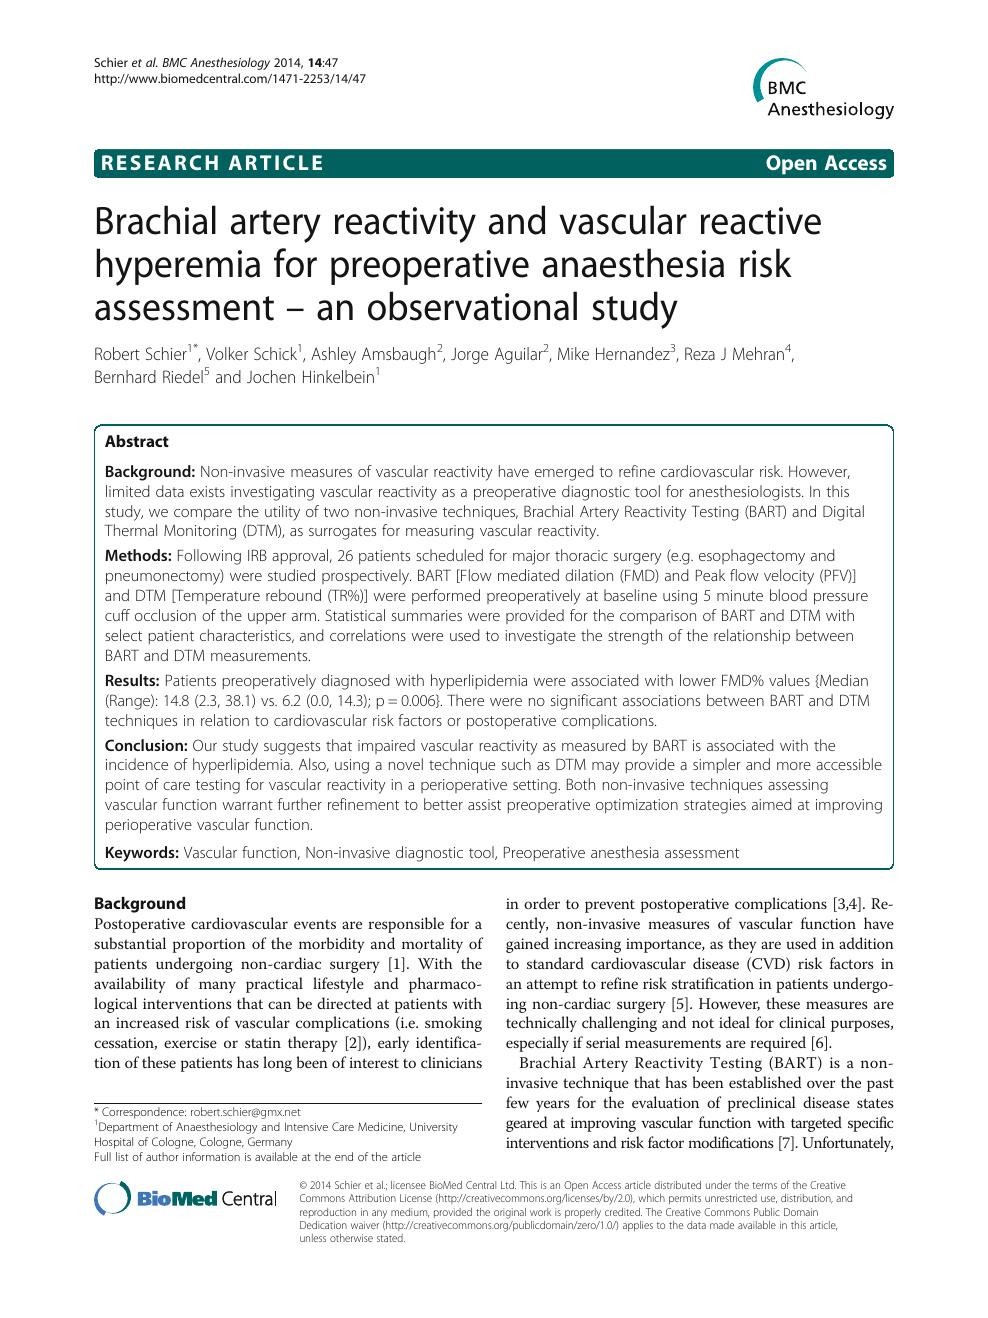 Brachial artery reactivity and vascular reactive hyperemia